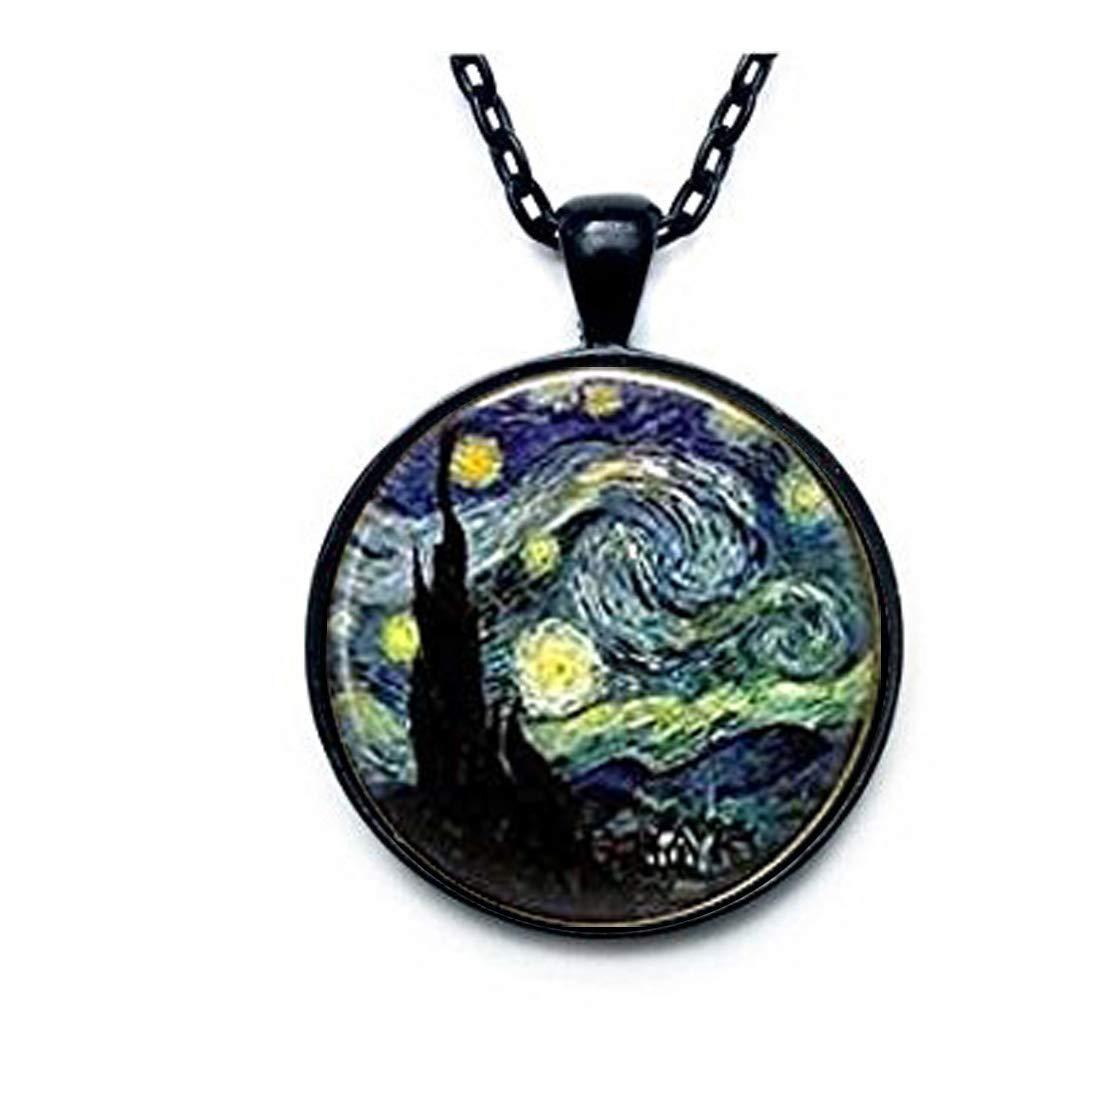 Starry Night Pendant, Starry Night Necklace, Vincent van Gogh Pendant